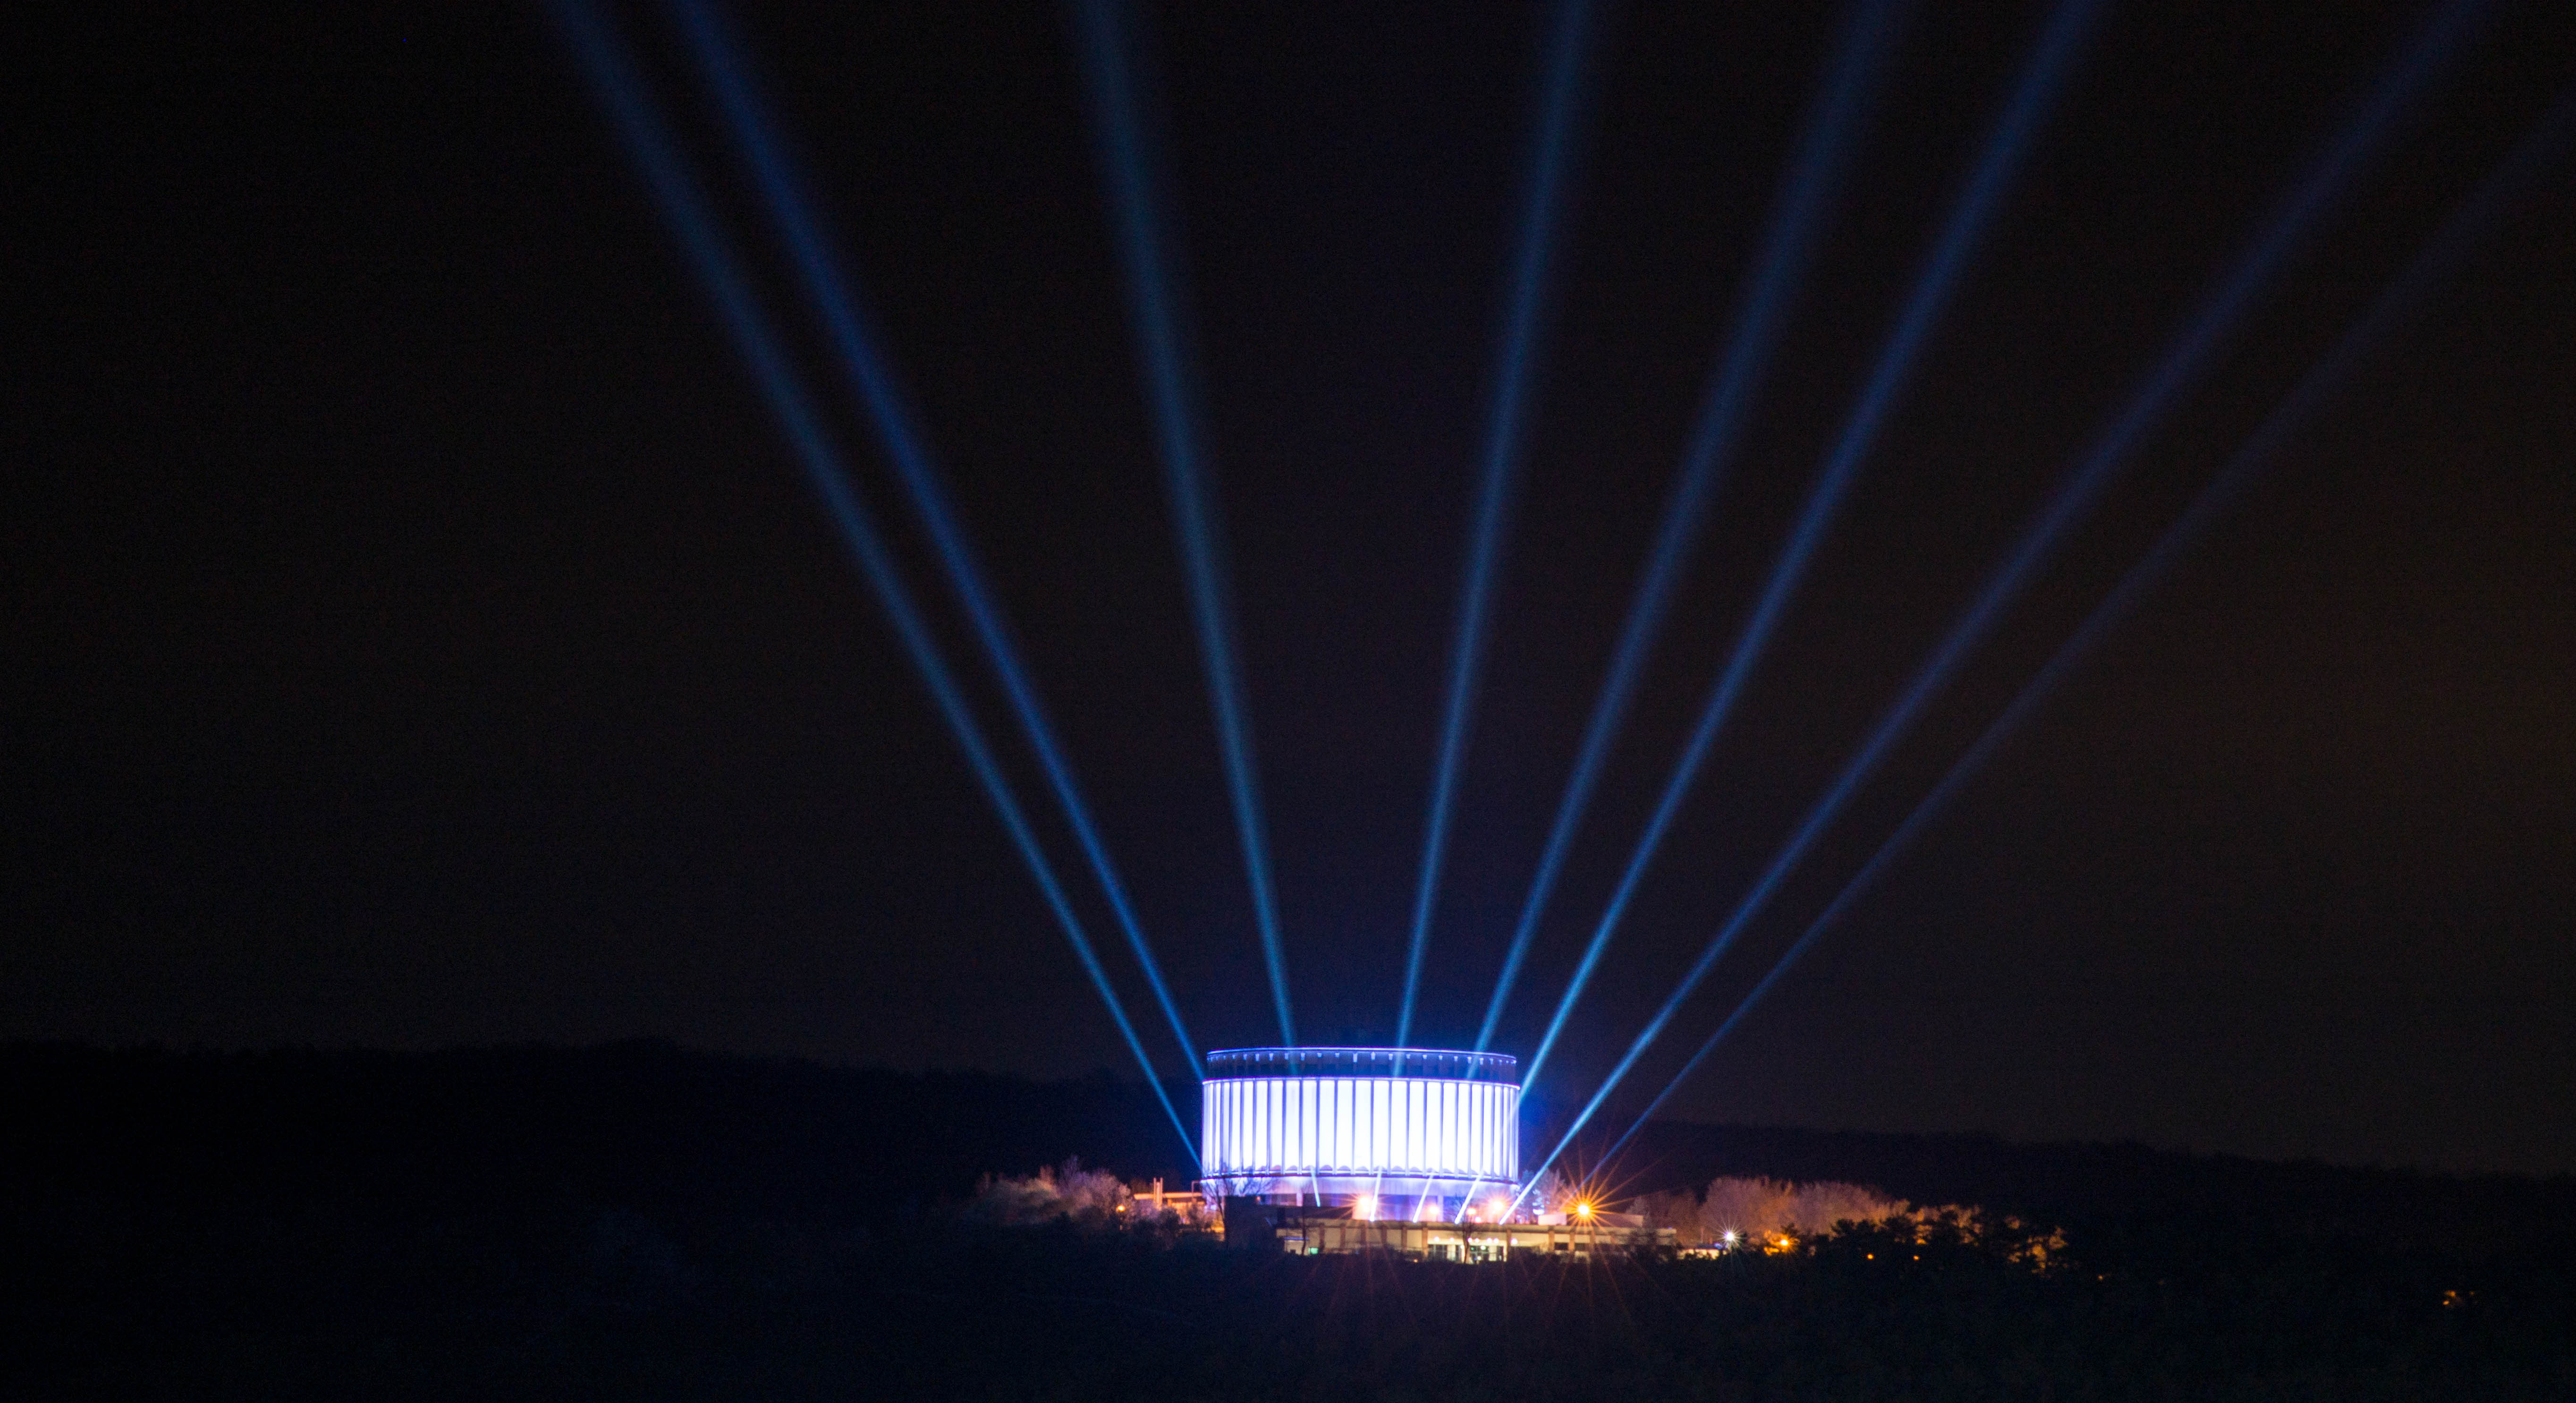 Panorama Bad Frankenhausen beleuchtet